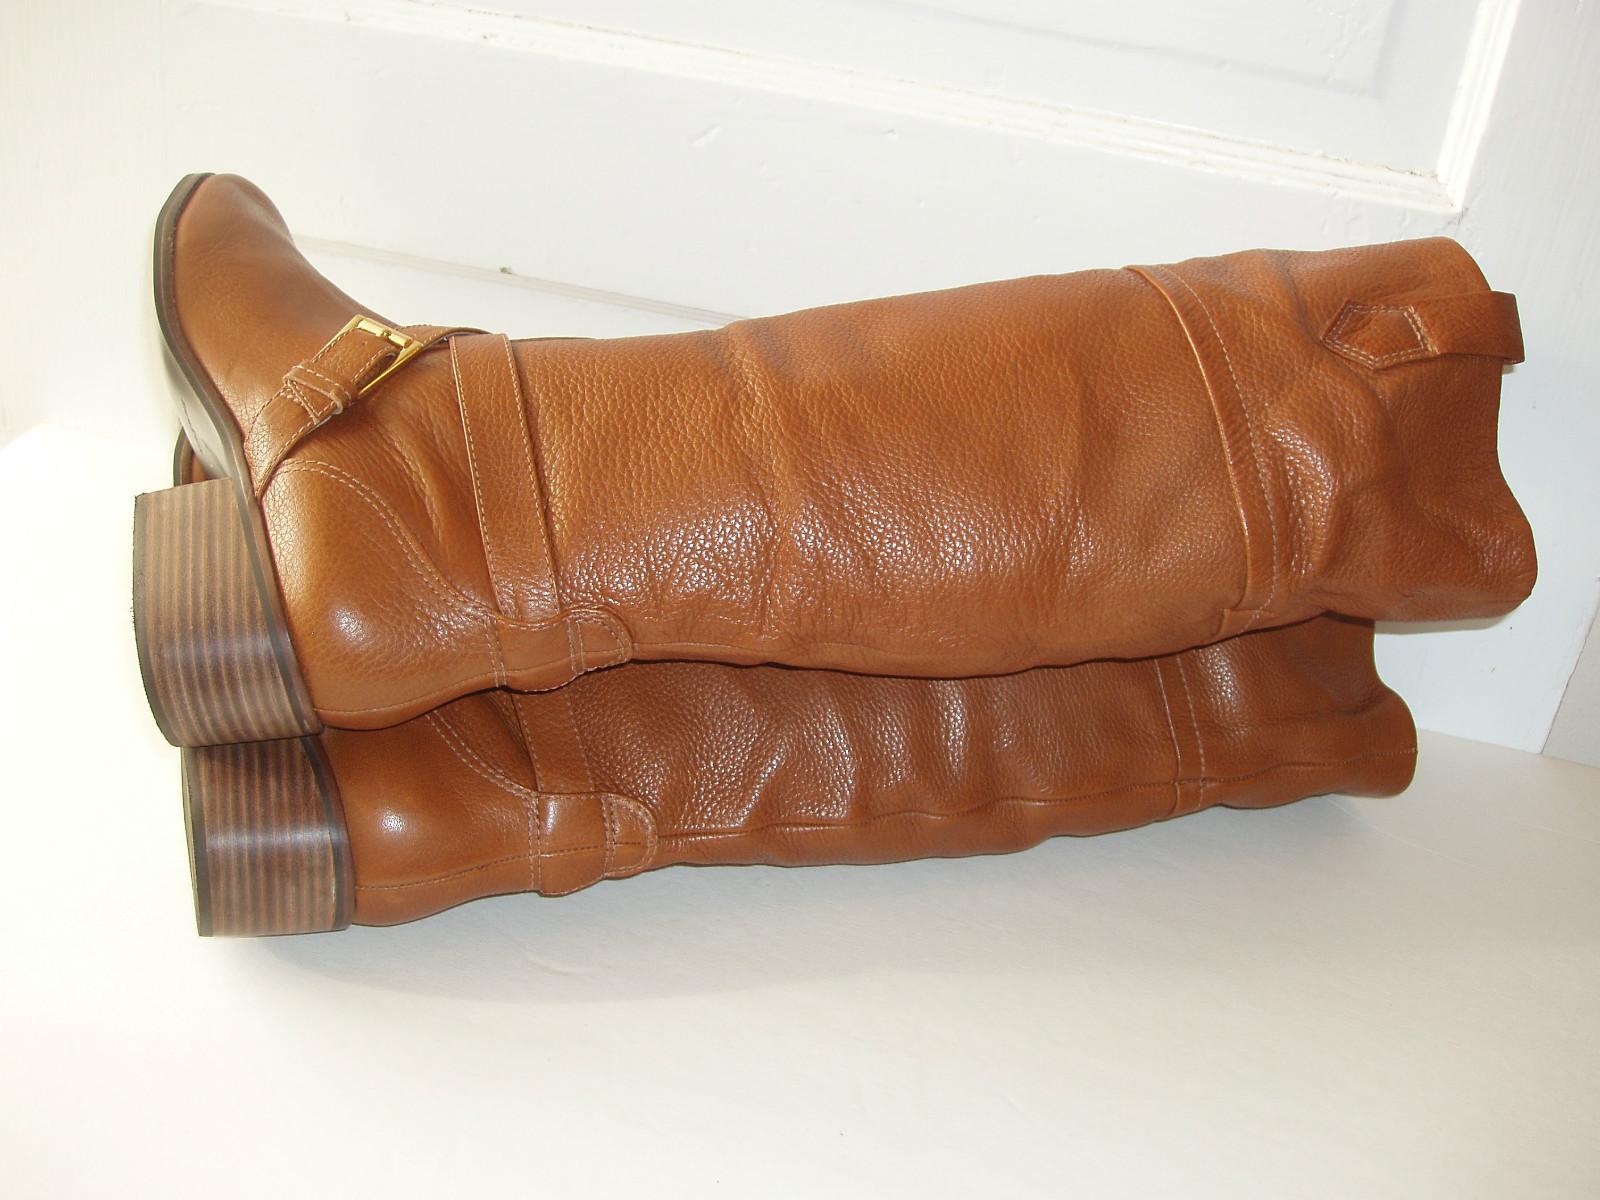 7ac92fc4c87 Pour La Victoire Vance British Tan Pebble Leather Pull-On Riding Boots Sz  10 NEW